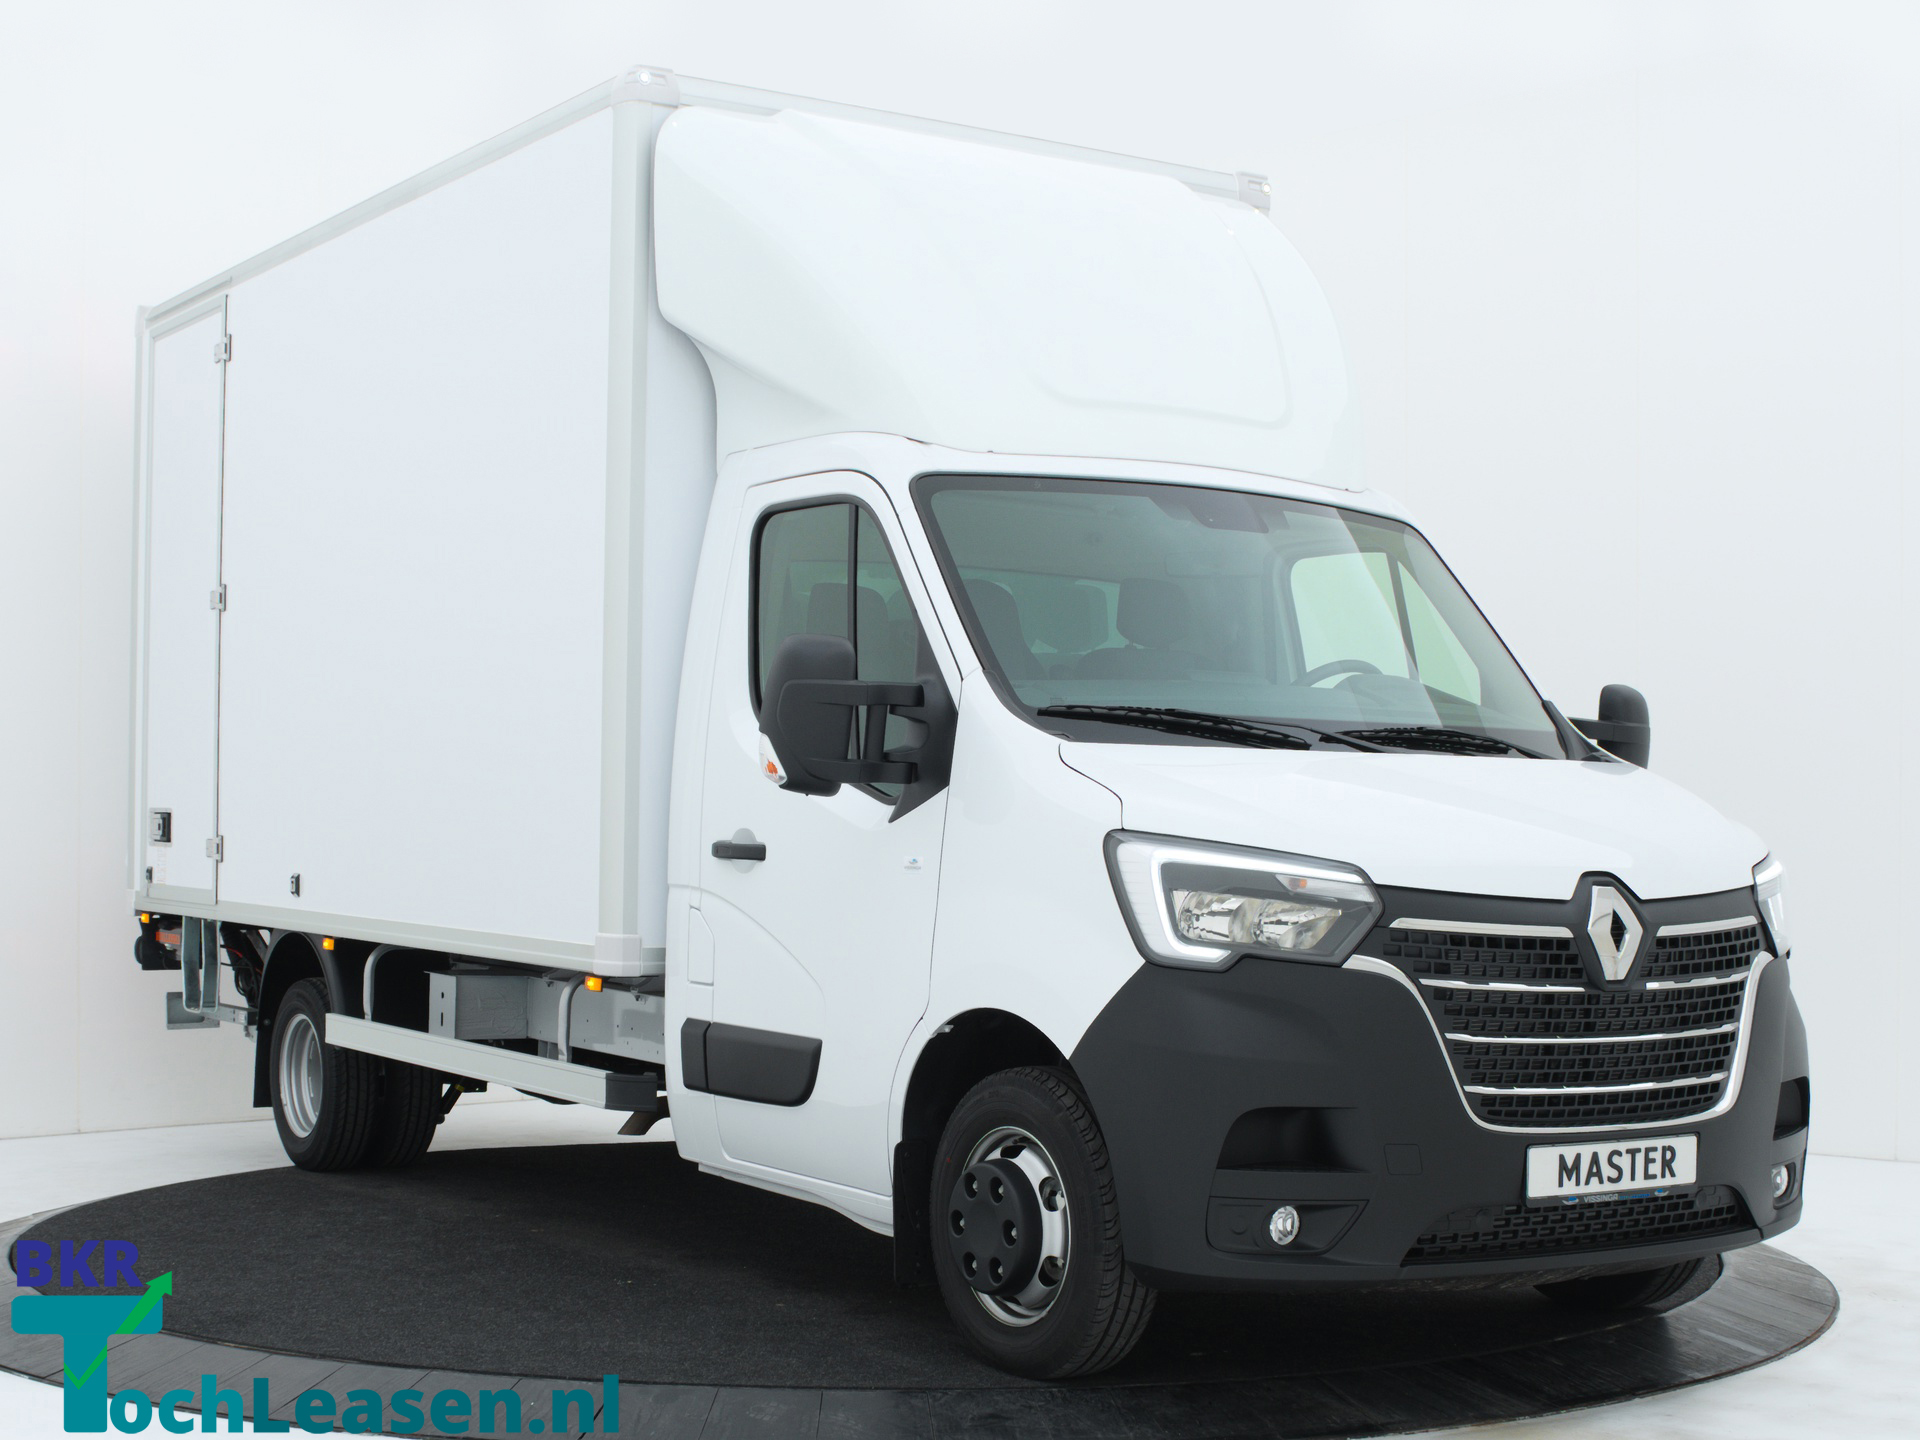 Renault Master bakwagen RWD schuinvooorkant 2 BKR toch Leasen